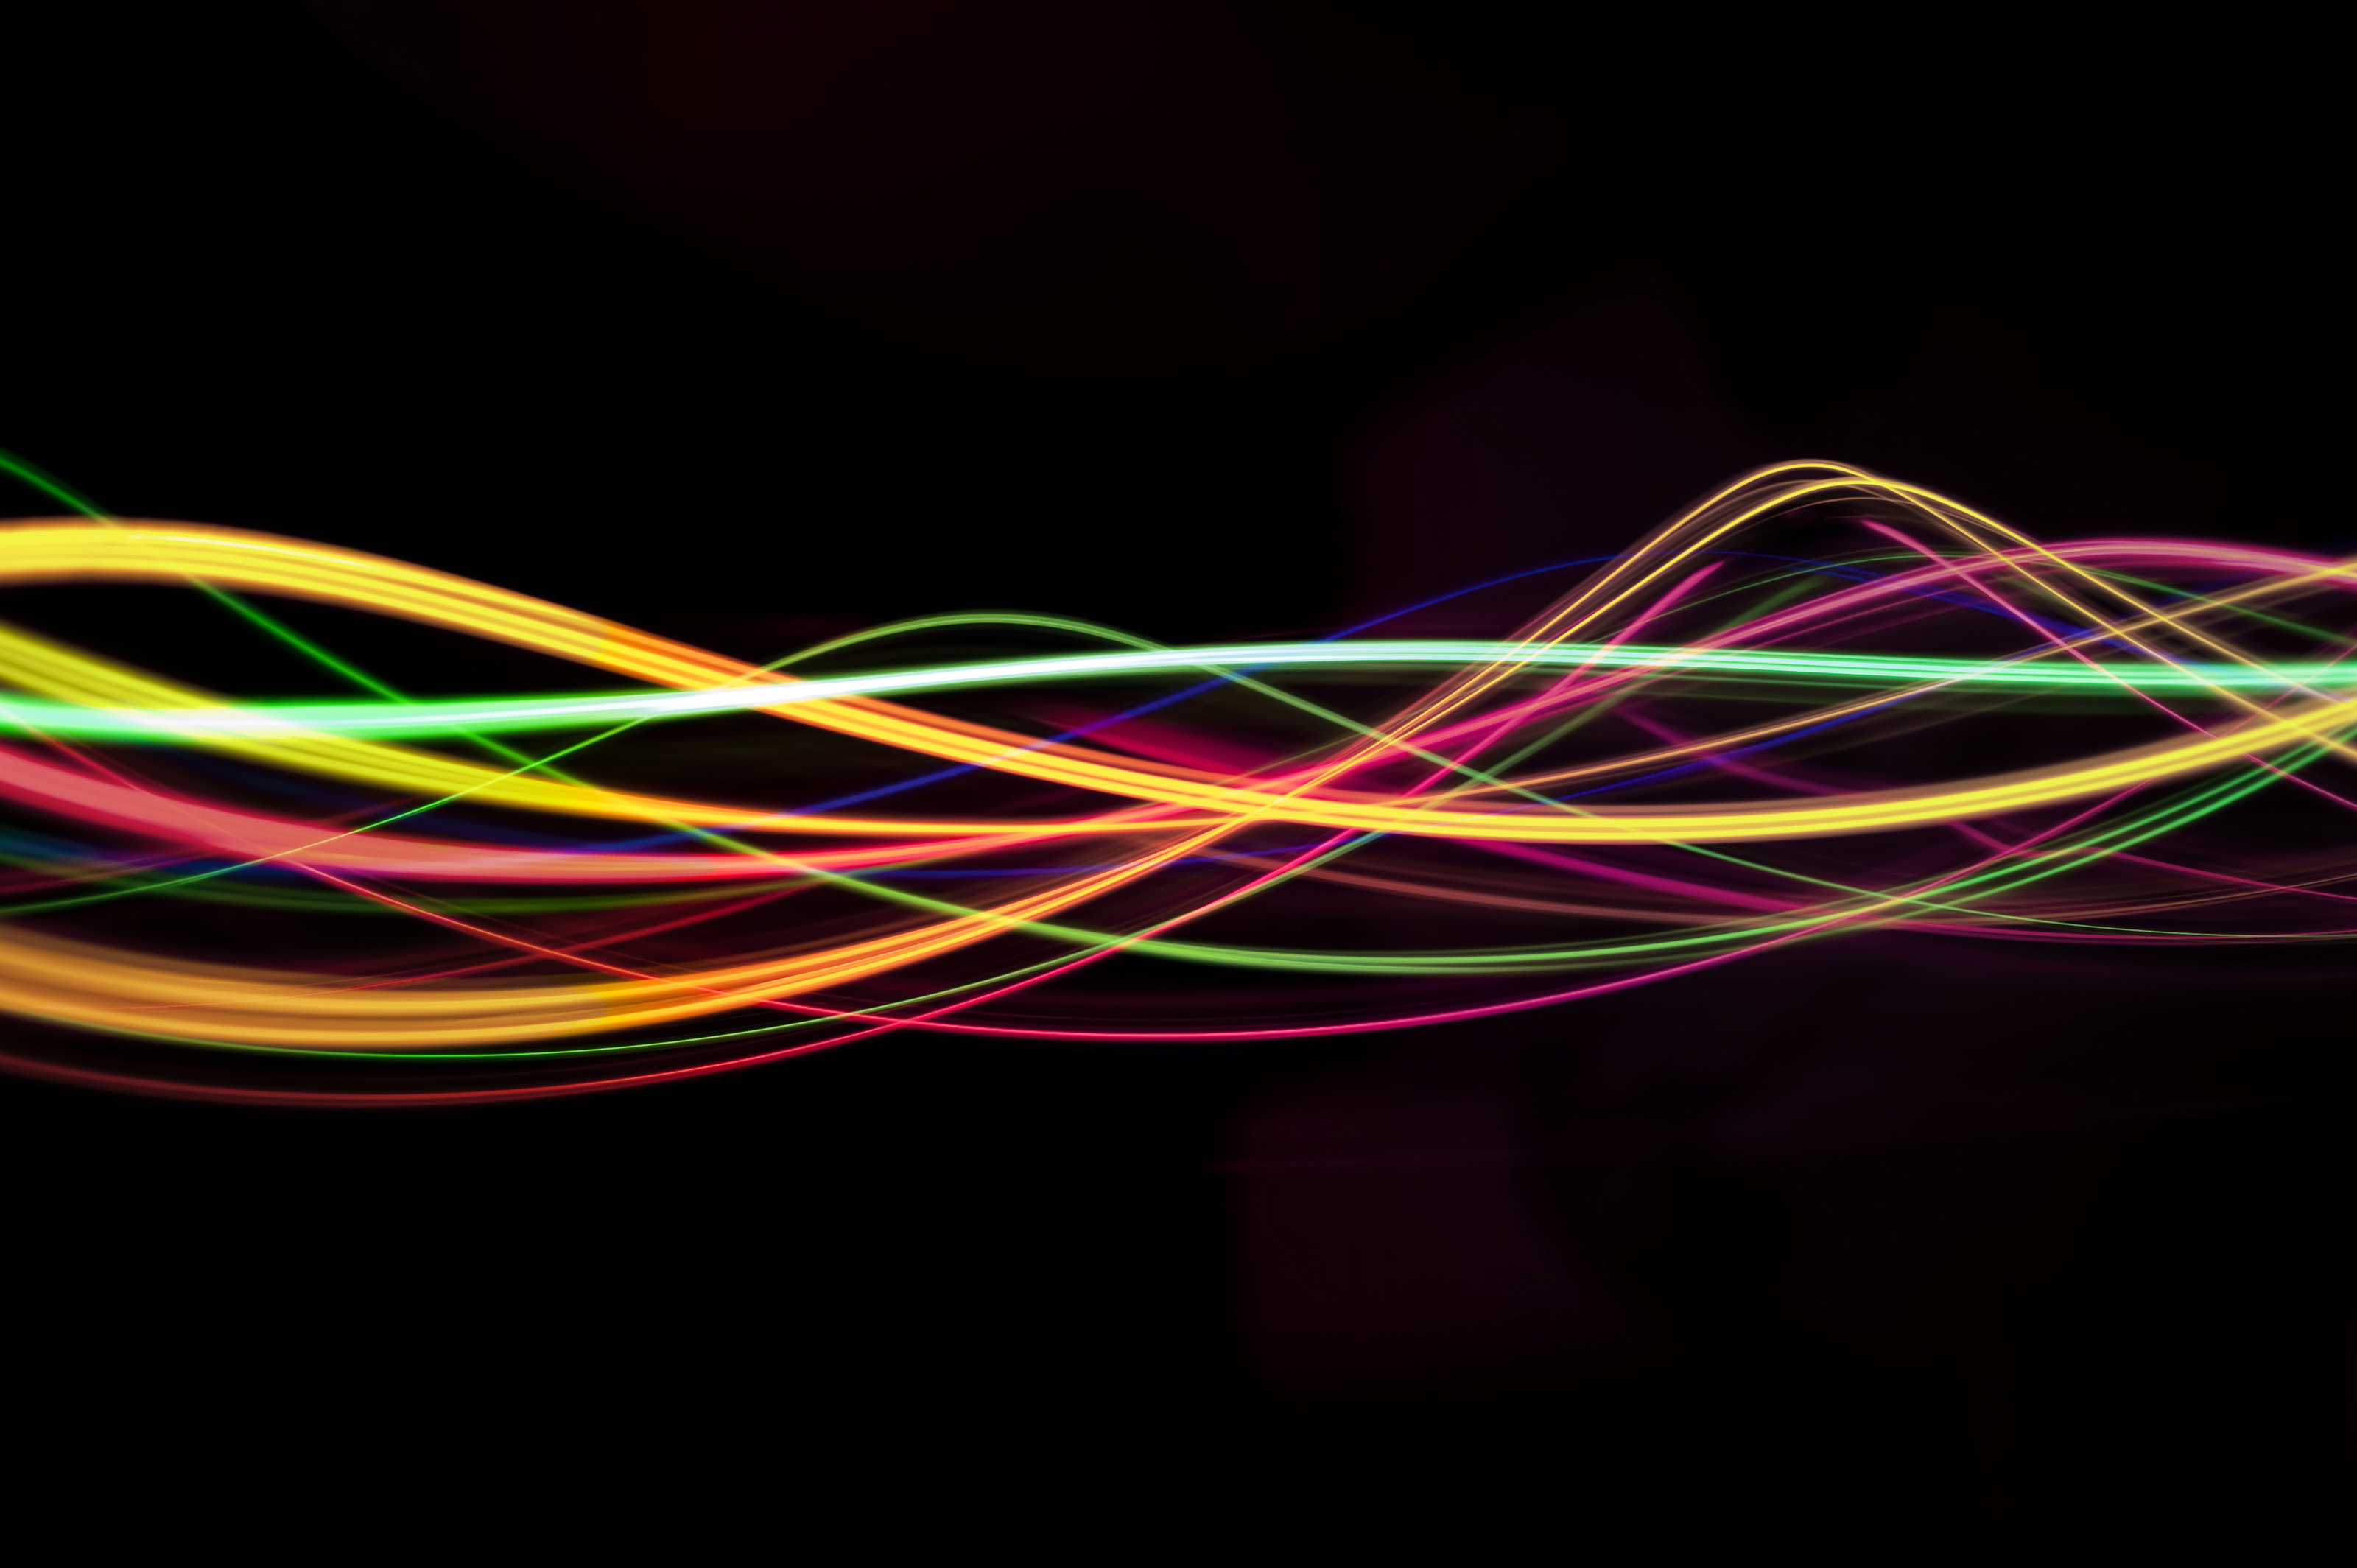 Electronic Music Wave Wallpaper